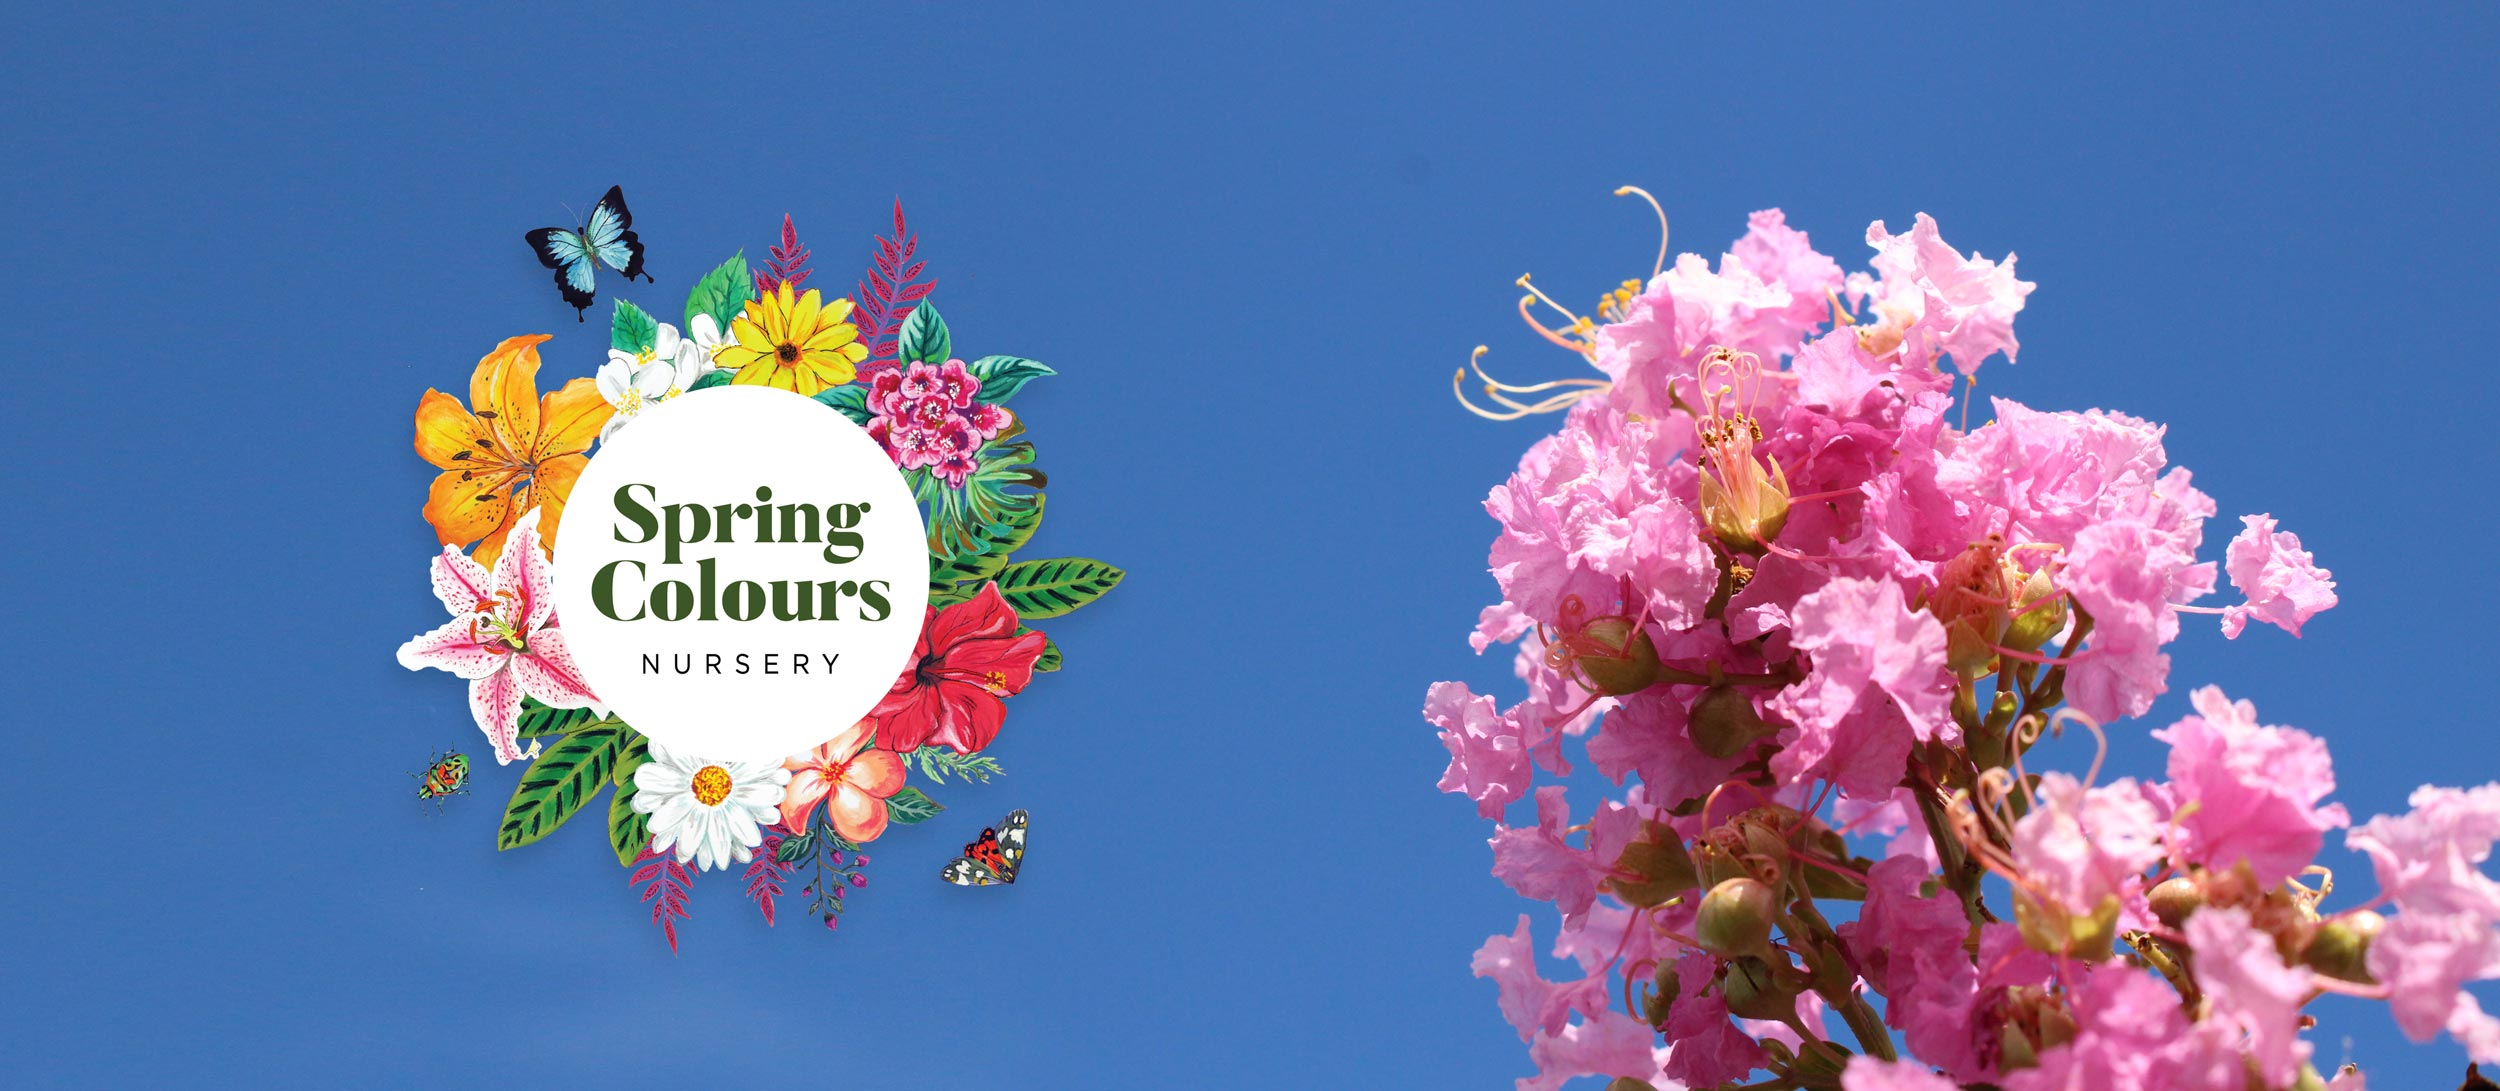 Spring Colours Nursery